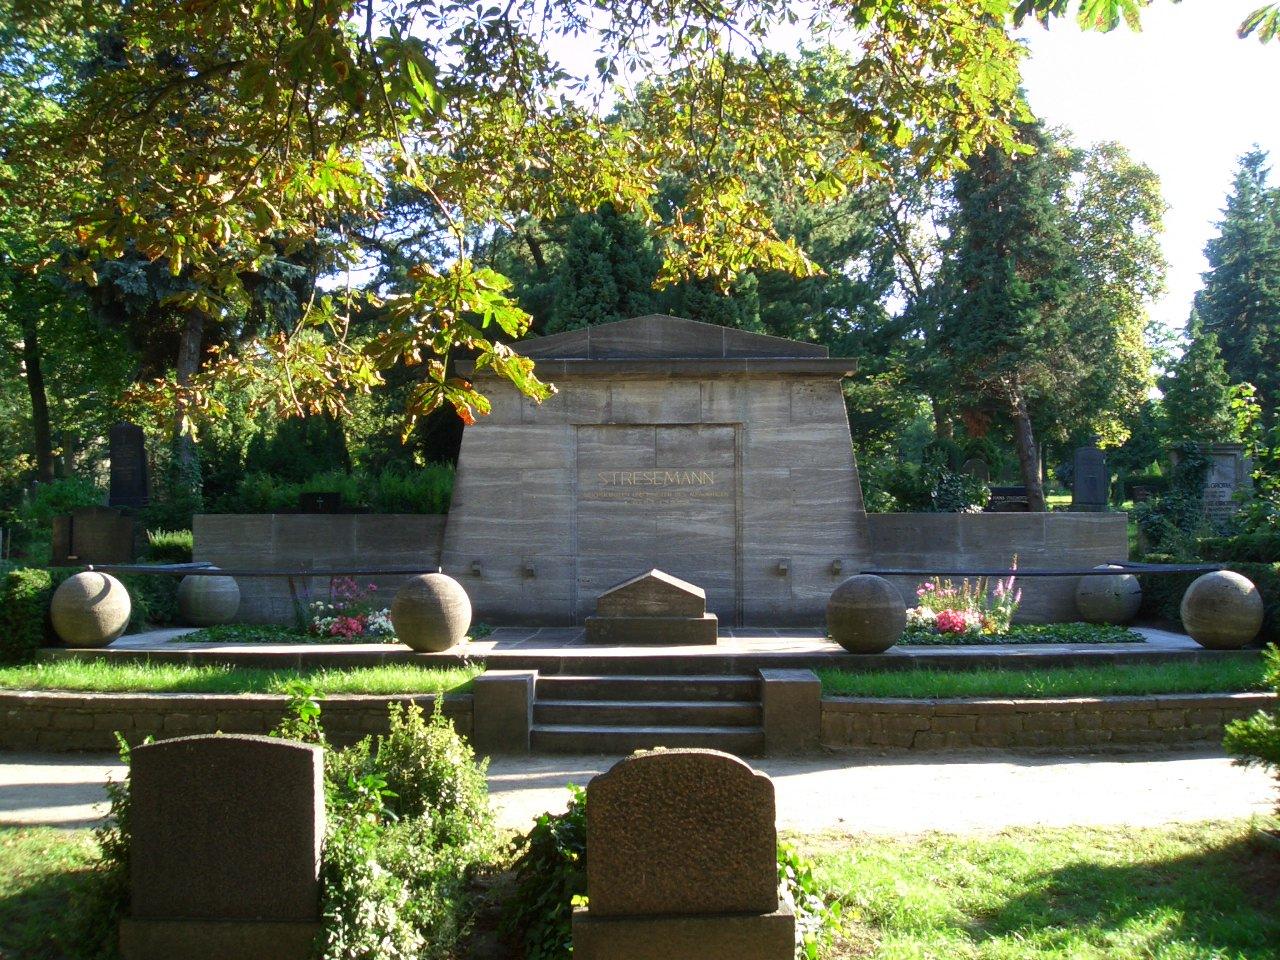 Bild Luisenstädtischer Friedhof Berlin